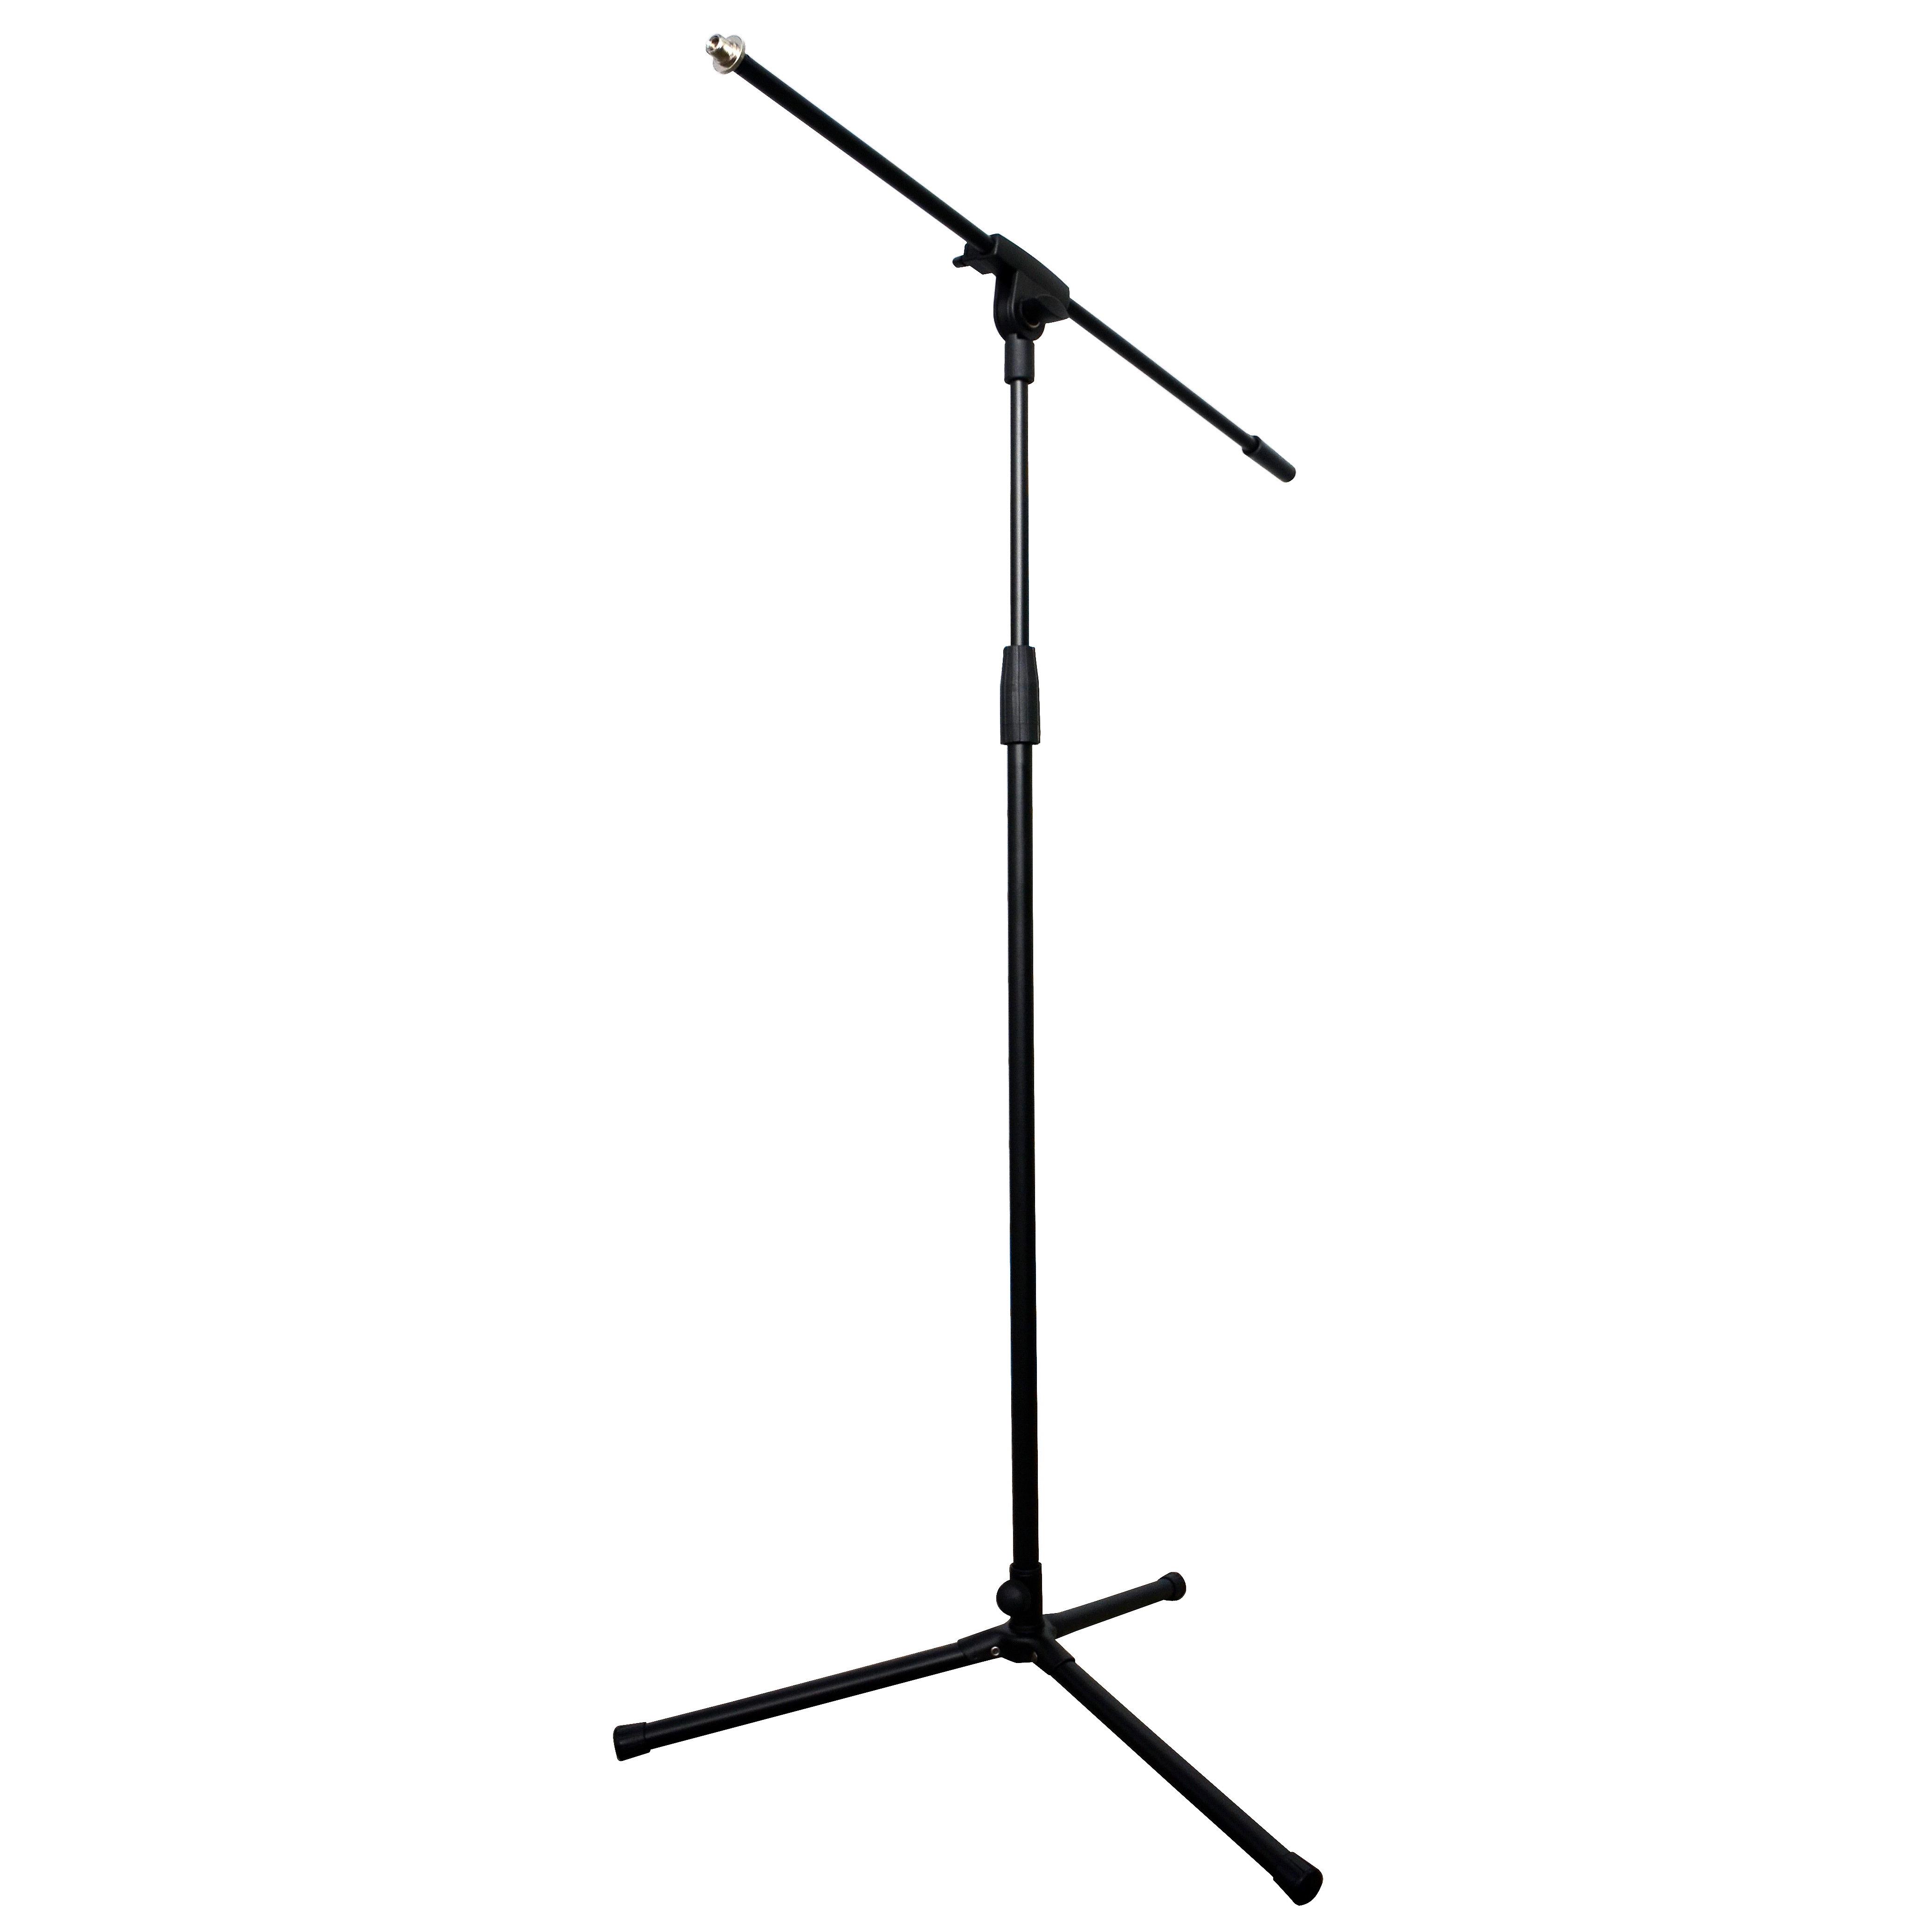 shiver pied de micro perche base ronde microphone. Black Bedroom Furniture Sets. Home Design Ideas